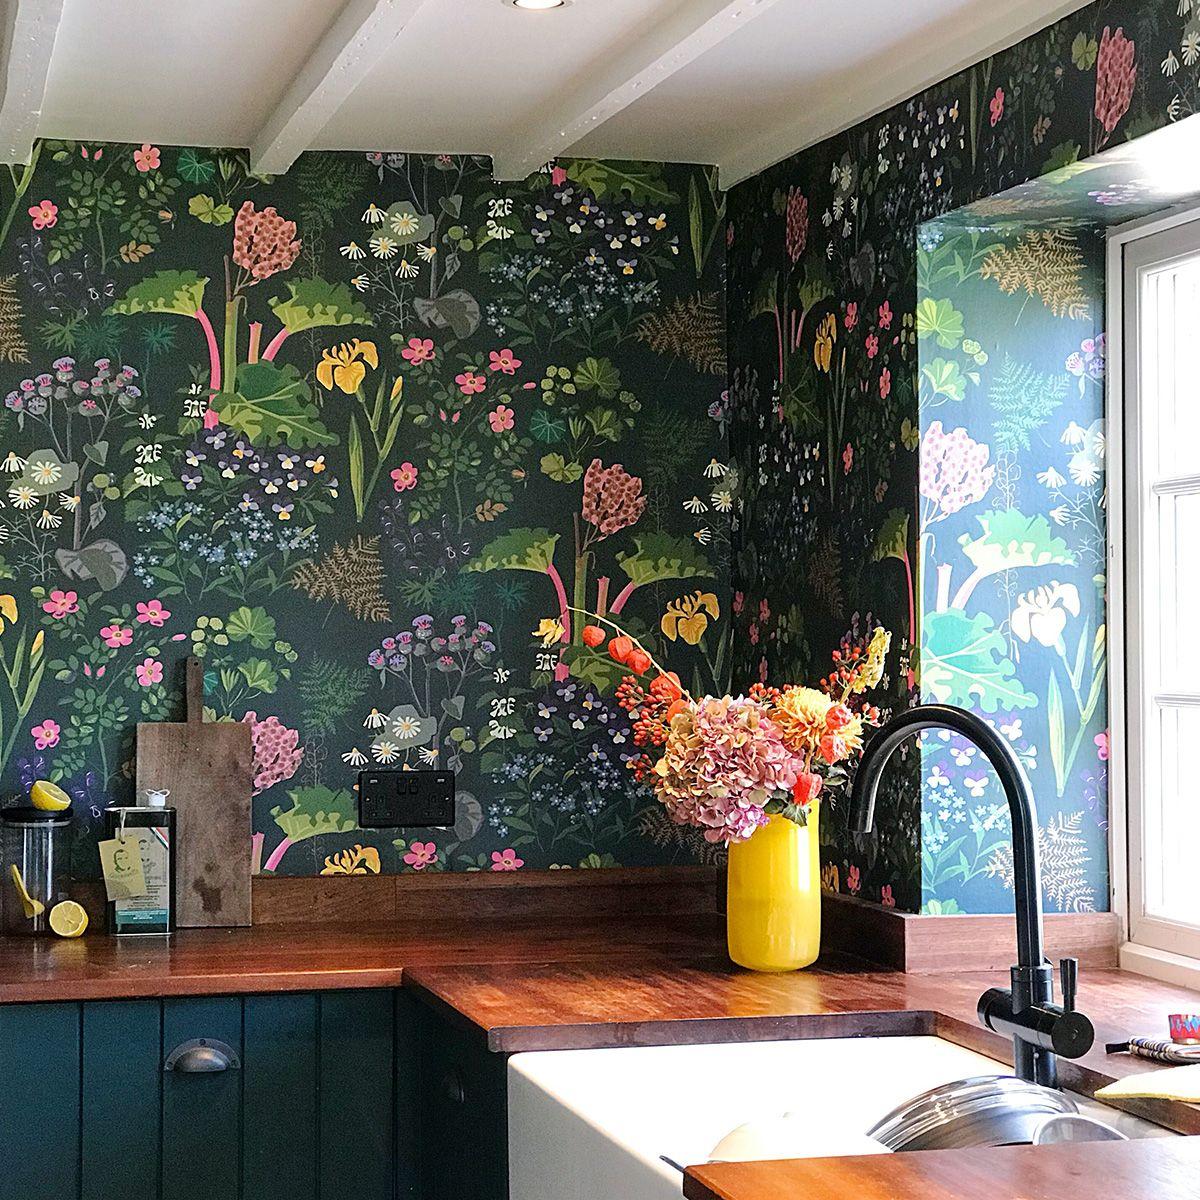 Quick And Easy Kitchen Updates That Make An Impact Sophie Robinson Cottage Kitchen Design Kitchen Wallpaper Sophie Robinson